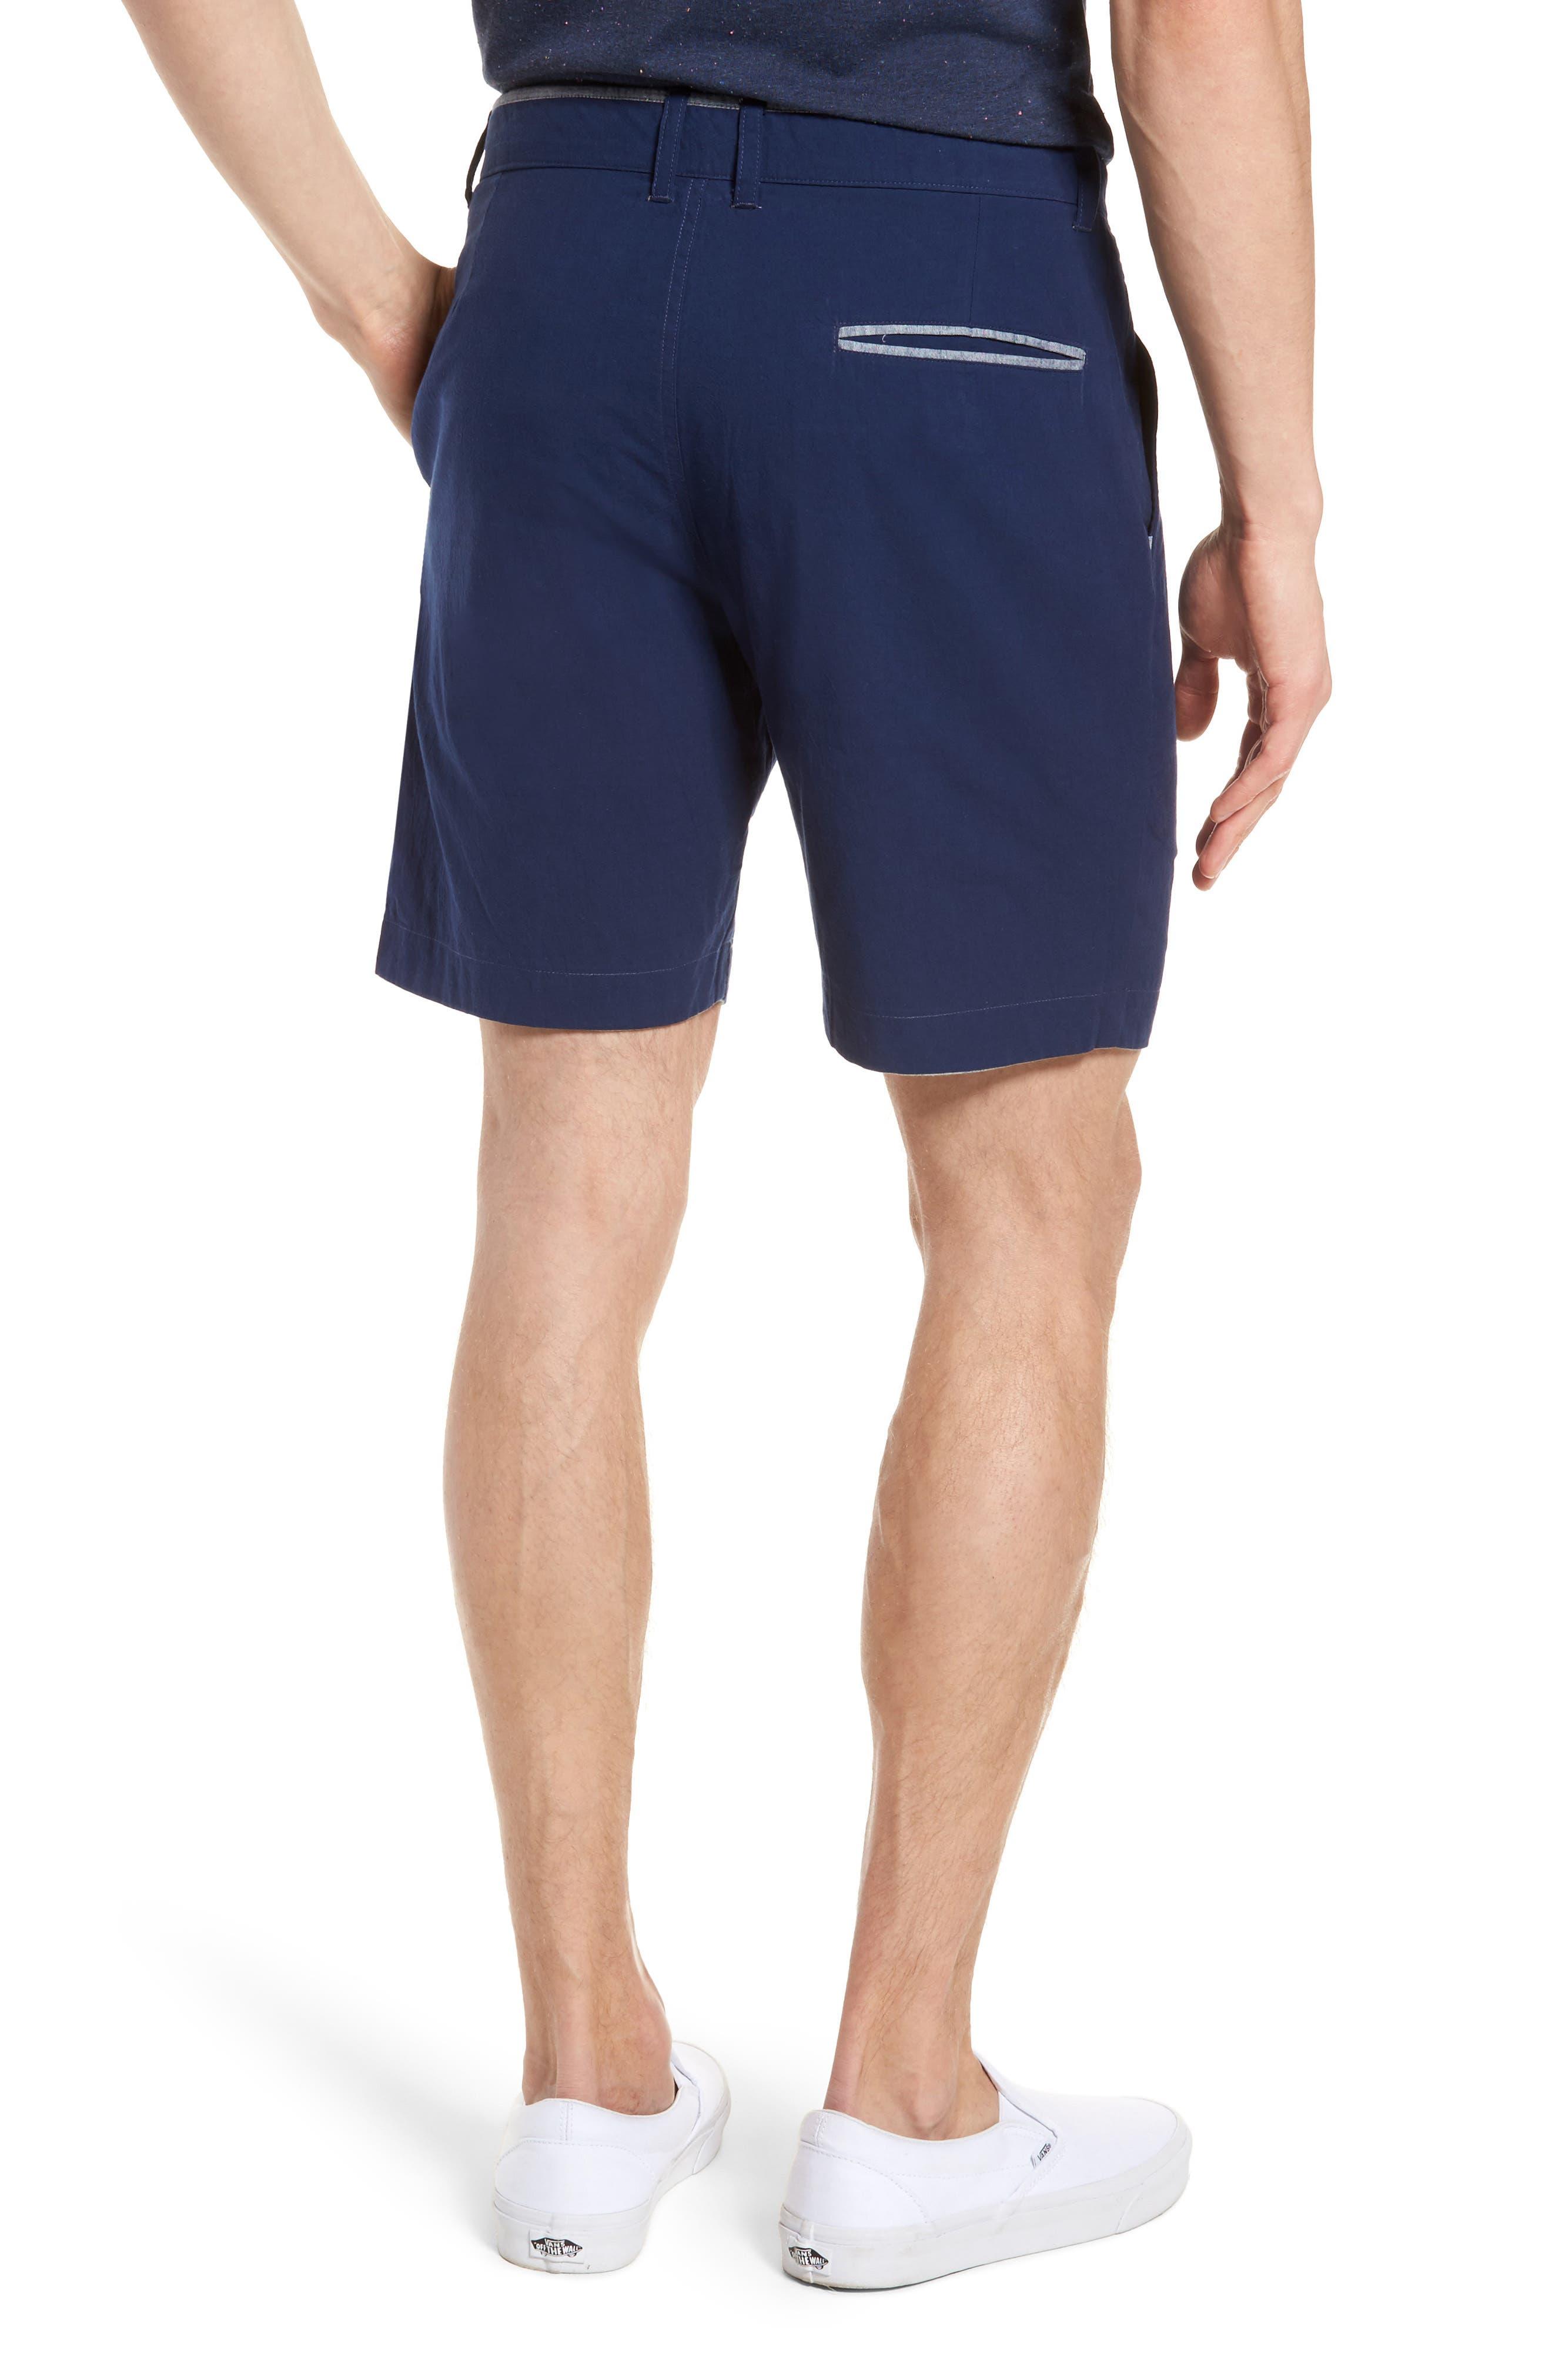 Rock Steady Reversible Shorts,                             Alternate thumbnail 3, color,                             Grey